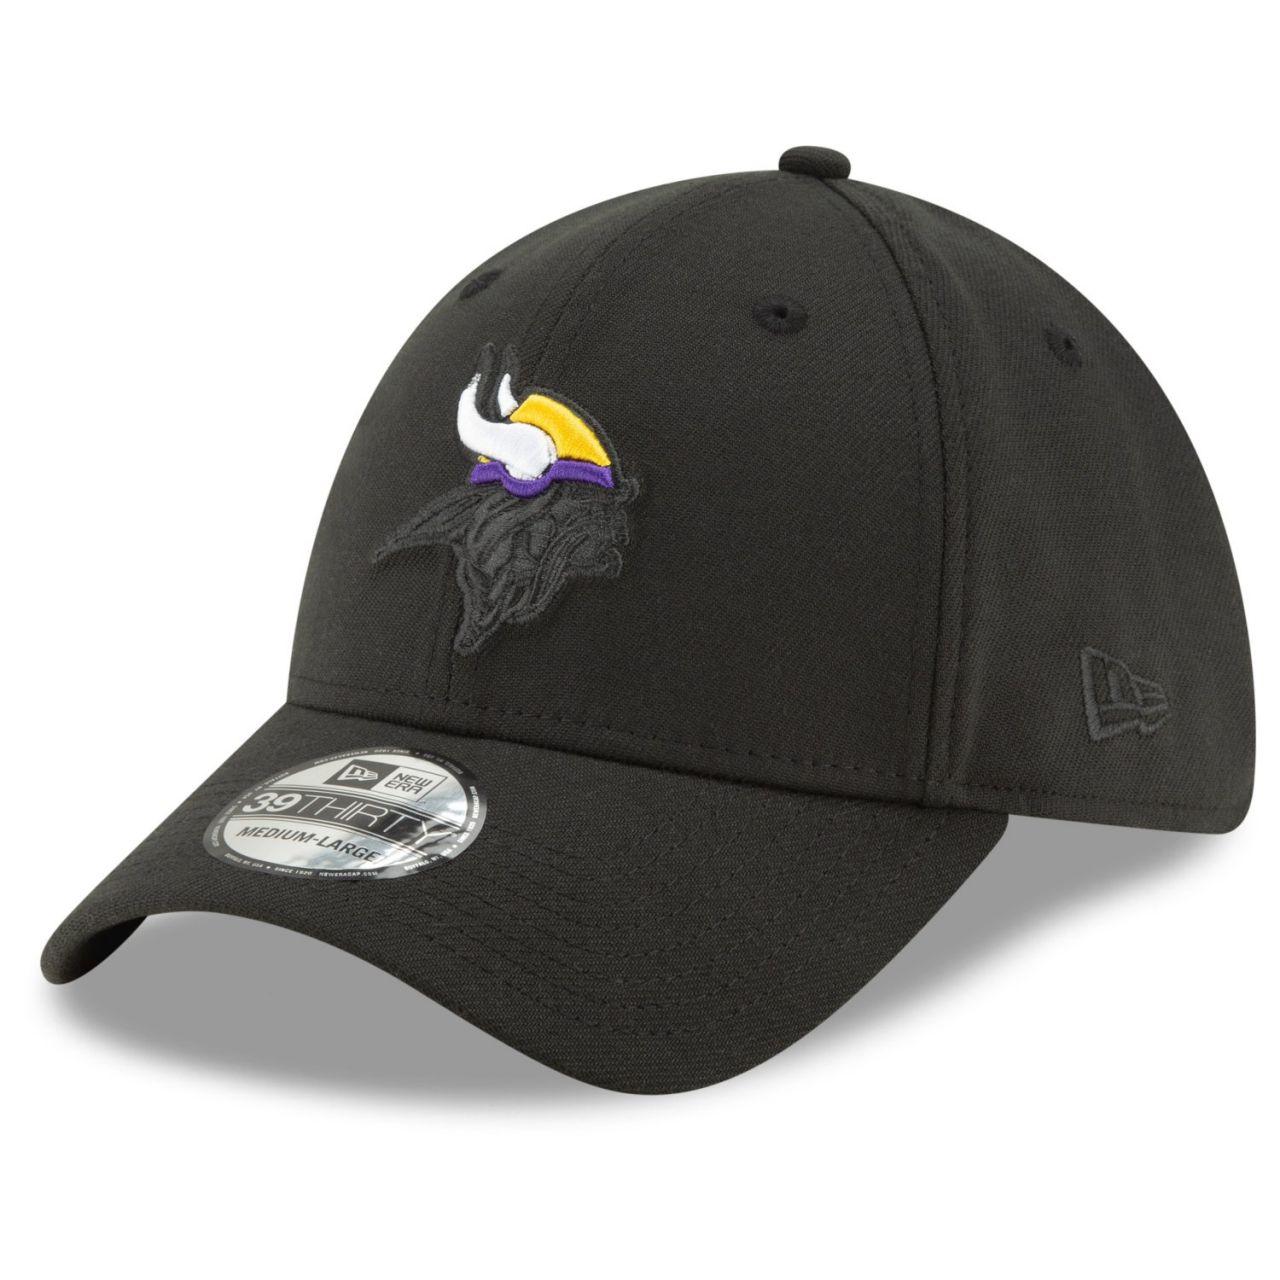 amfoo - New Era 39Thirty Stretch Cap - ELEMENTS Minnesota Vikings